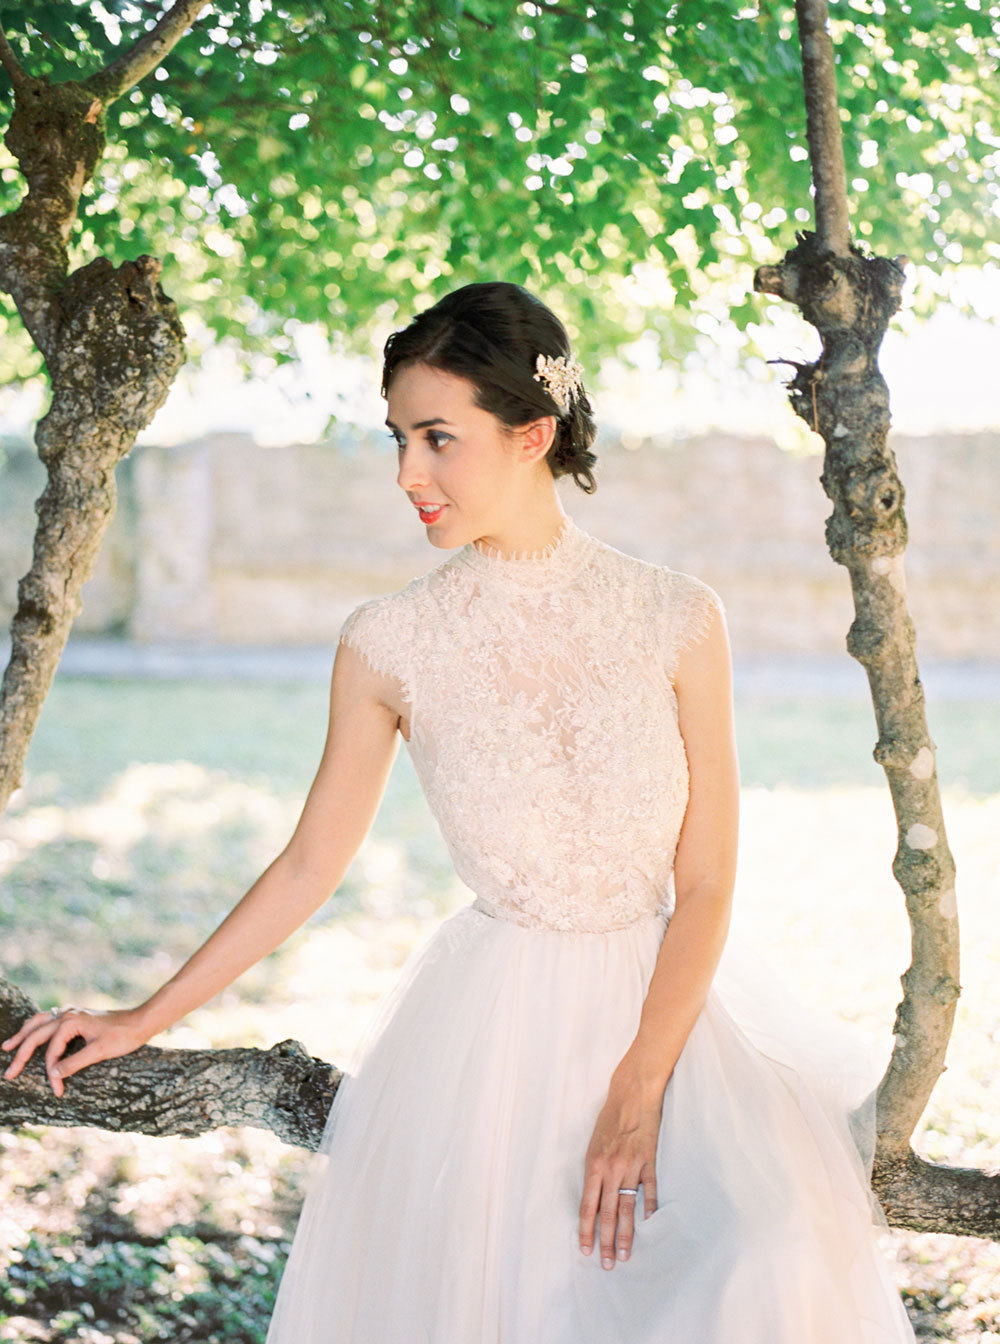 Linari-Tuscany-Elopement-Courtney-Michaela-272